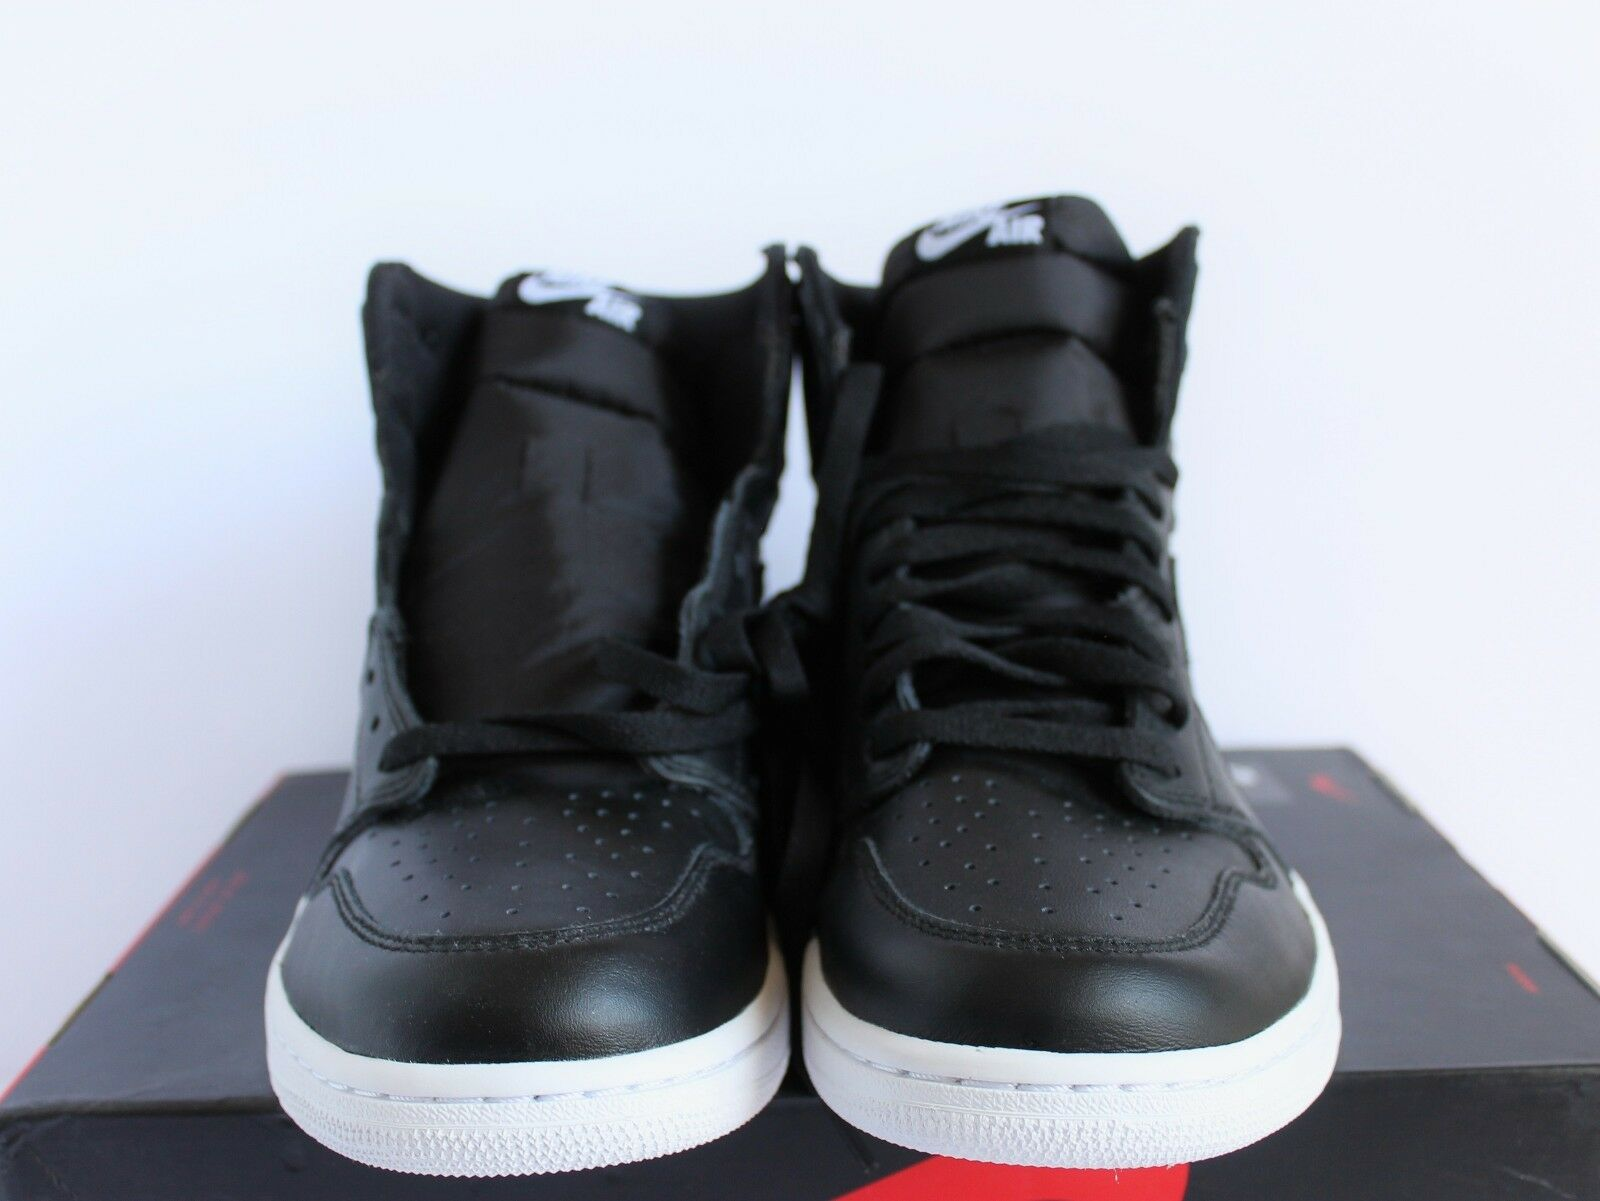 'uomini Nero 1 Alto Air Cyber Lunedì Jordan Bianco Og Nike fIYymvb76g